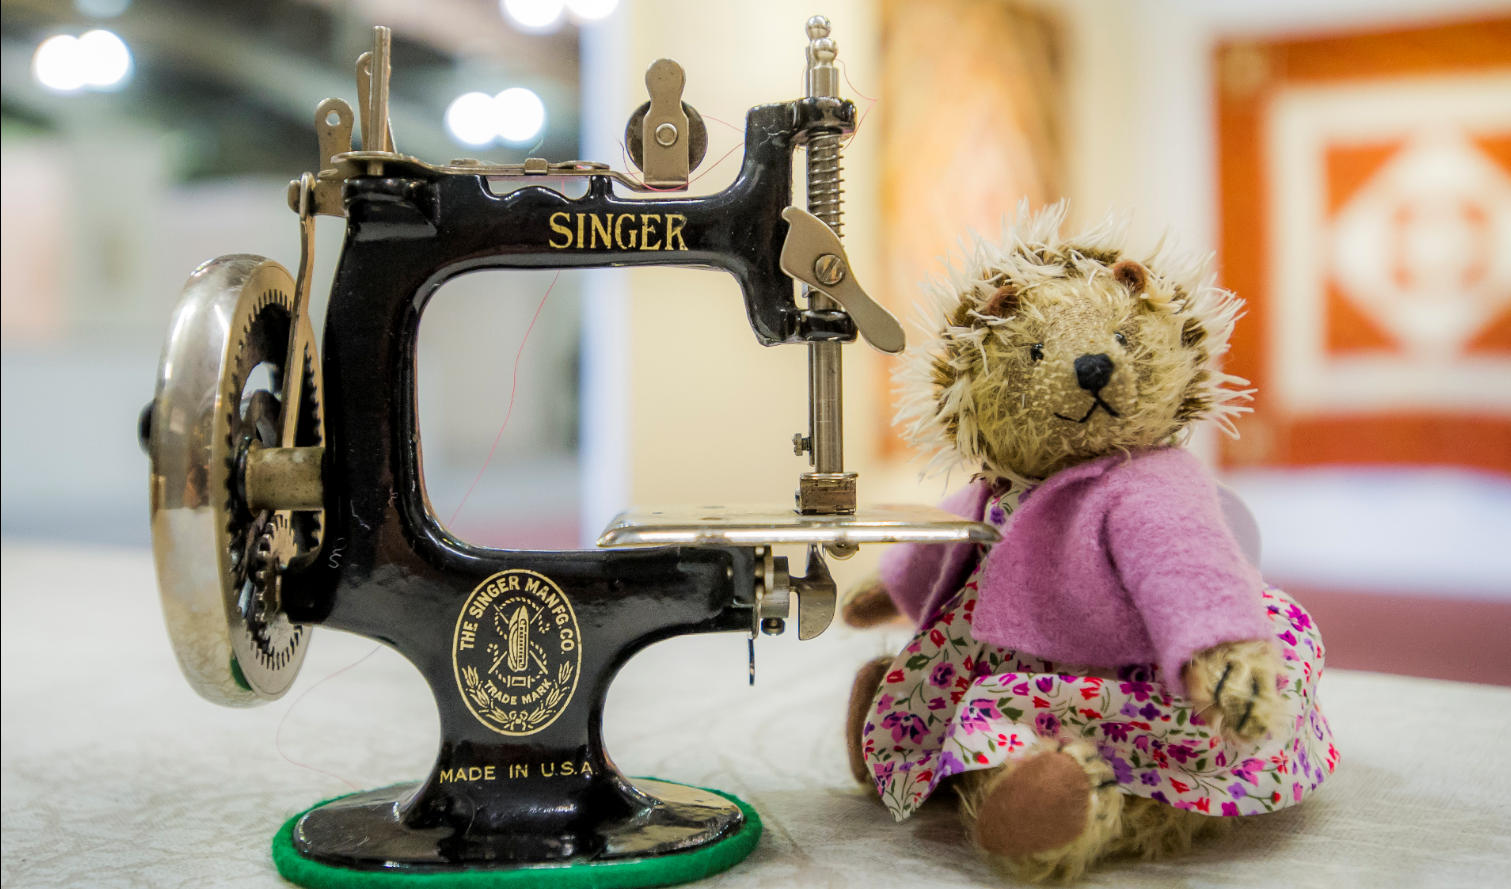 Craft| Knitting & Stitching Show Dublin, Nov 8th – 11th 2018.